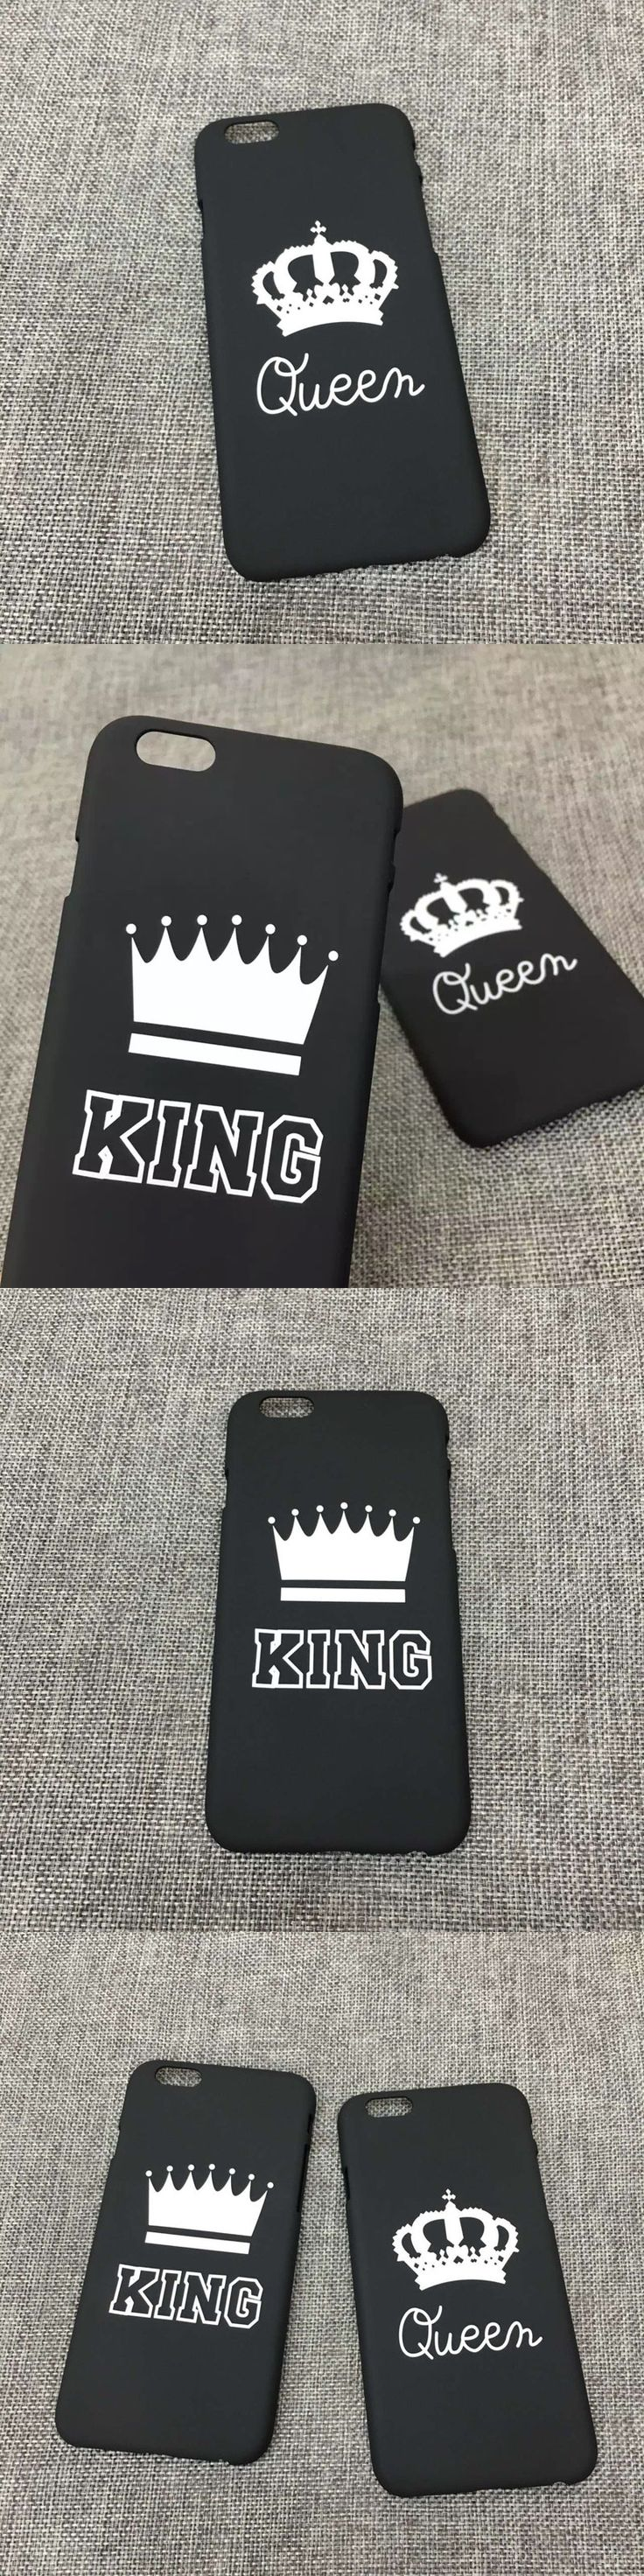 New Fashion Lovers Black Letter Case Matte Hard Plastic Cover Capa Carcasa Funda Coque For iPhone 7 7 plus 6 6s 6 plus 5 5s Case